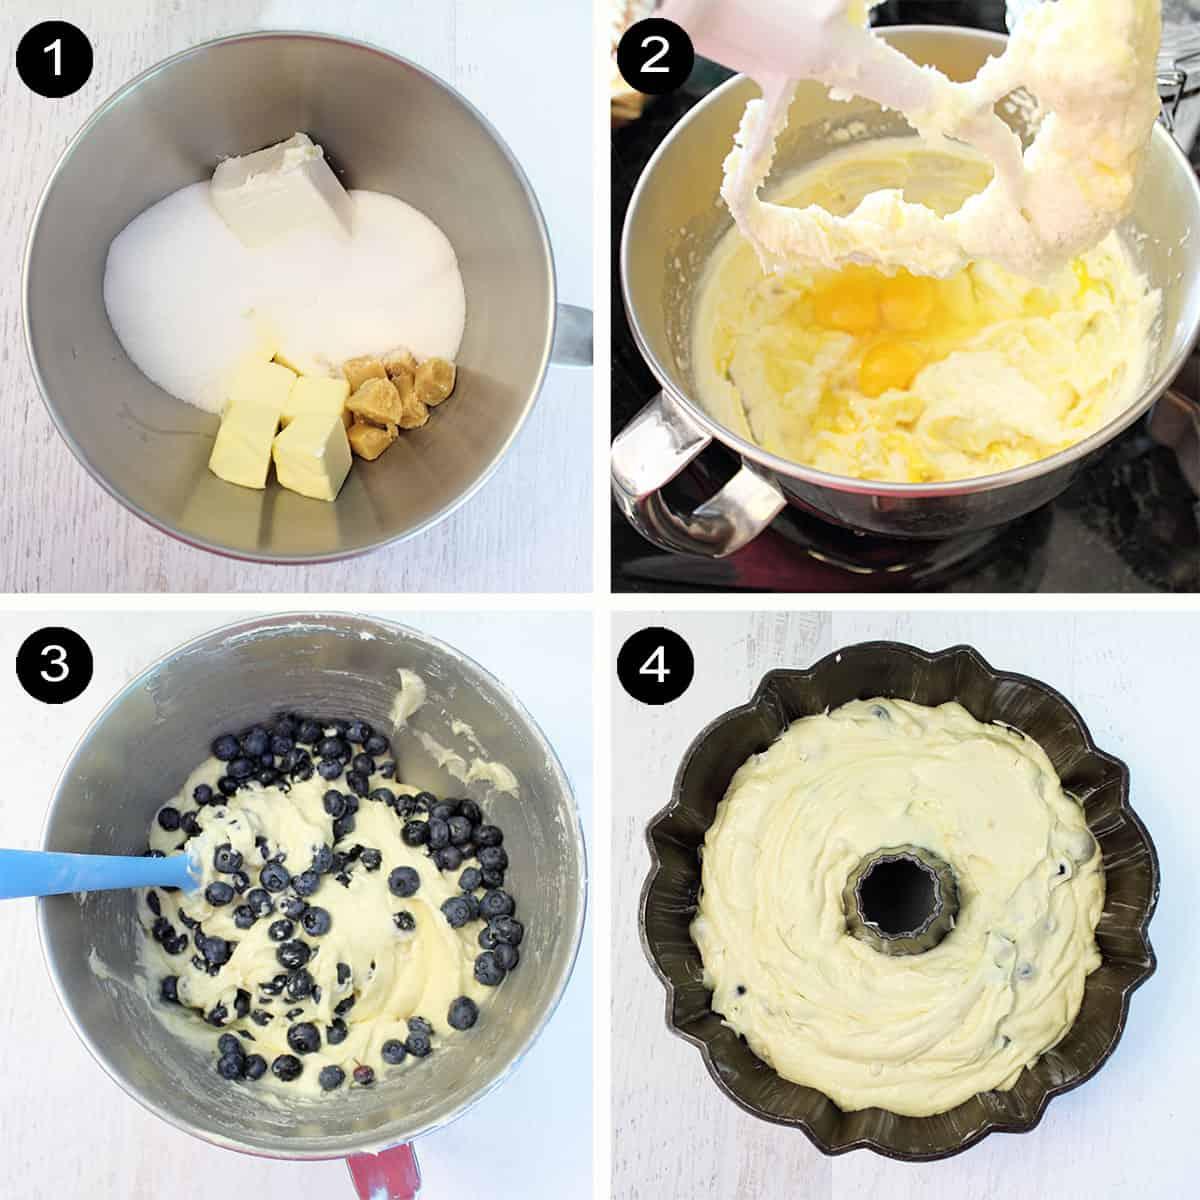 Prep steps 1-4 for bundt cake.